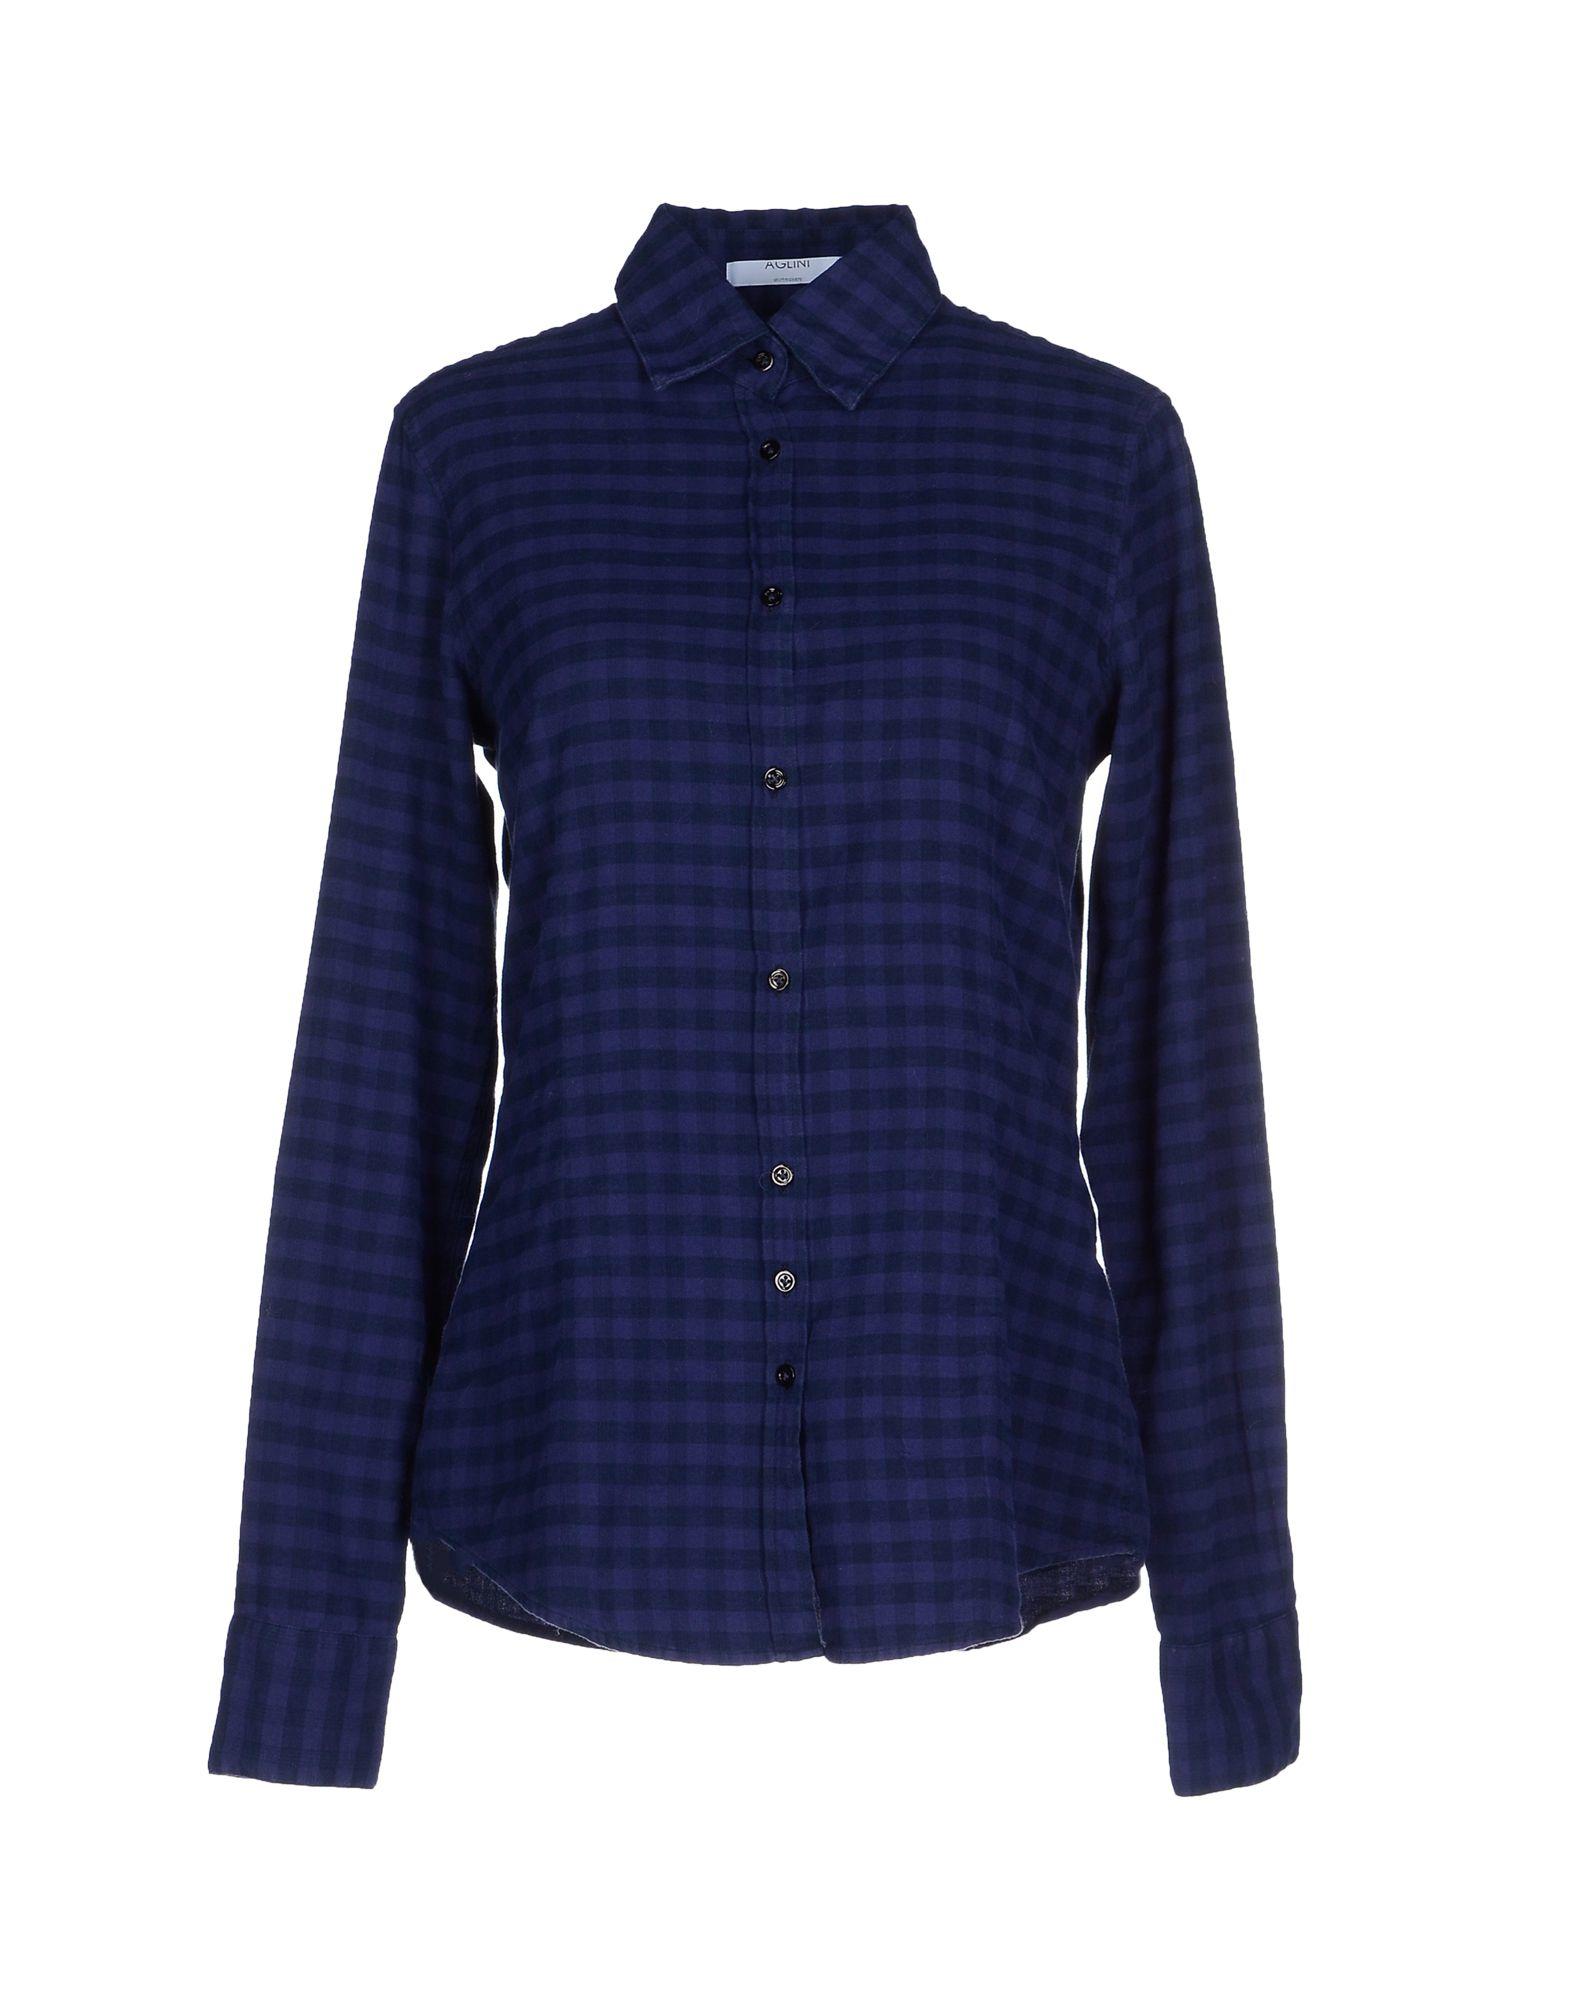 Lyst - Aglini Shirt in Purple